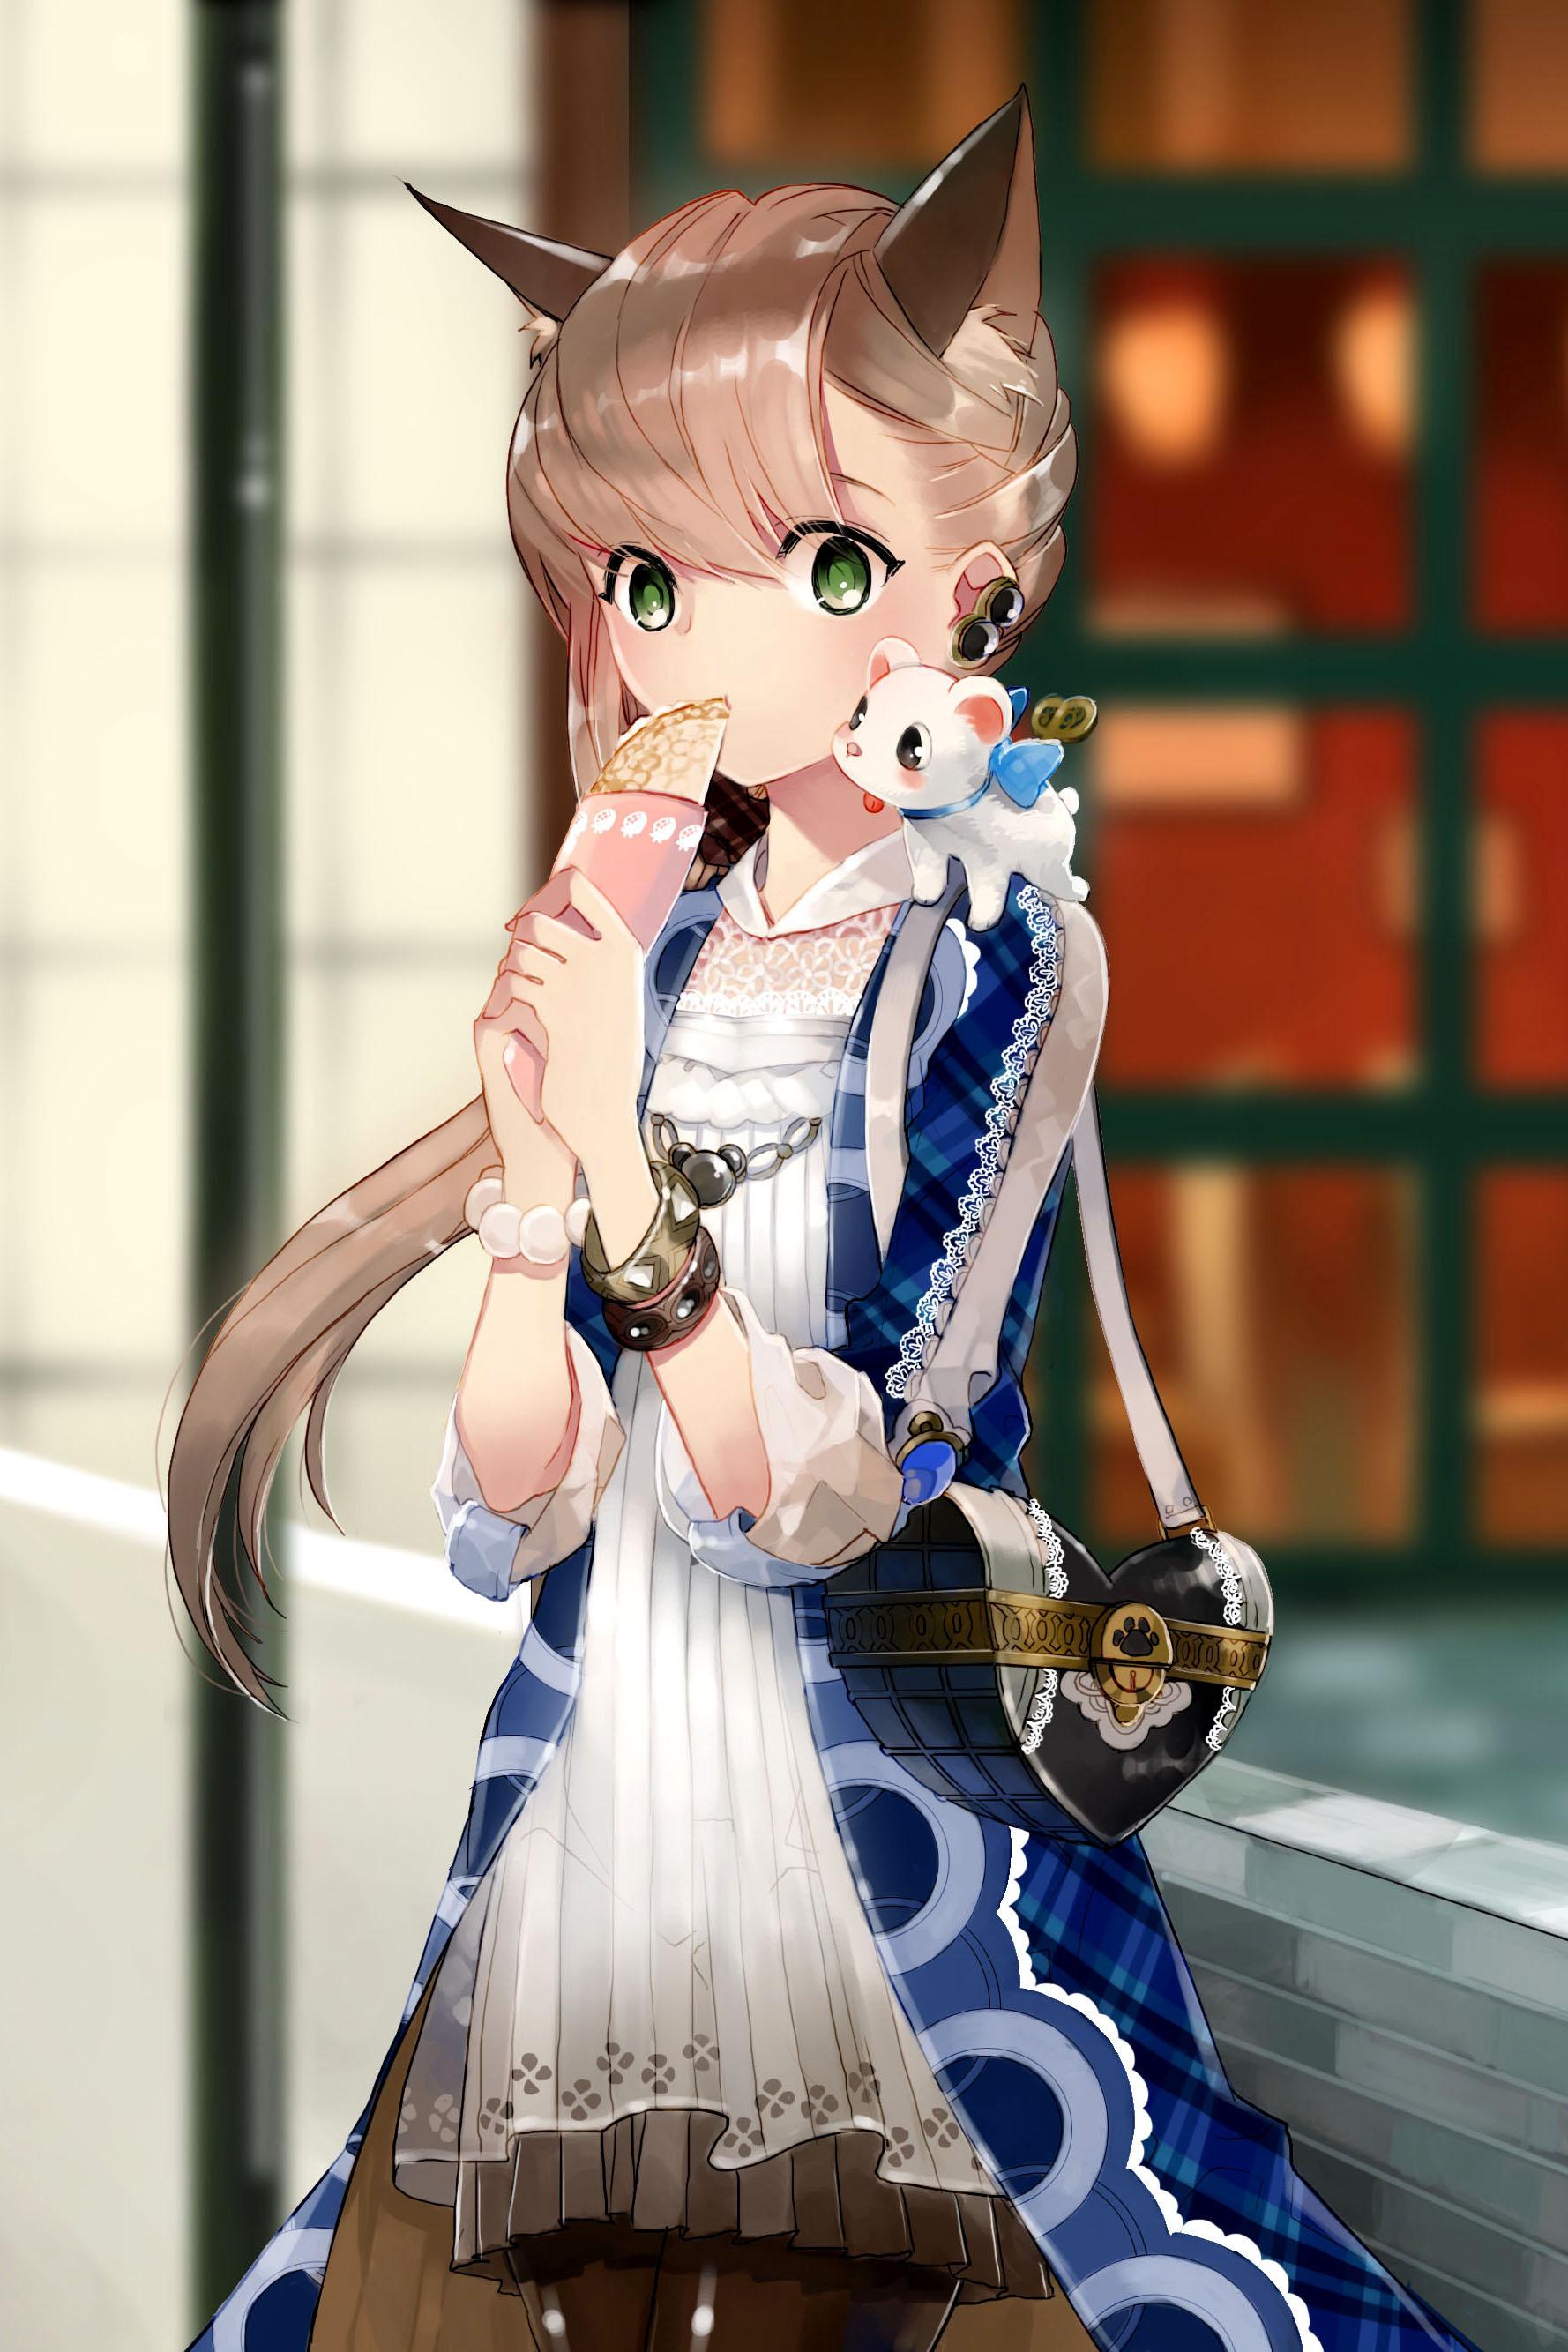 anime_wallpaper_17173197.jpeg